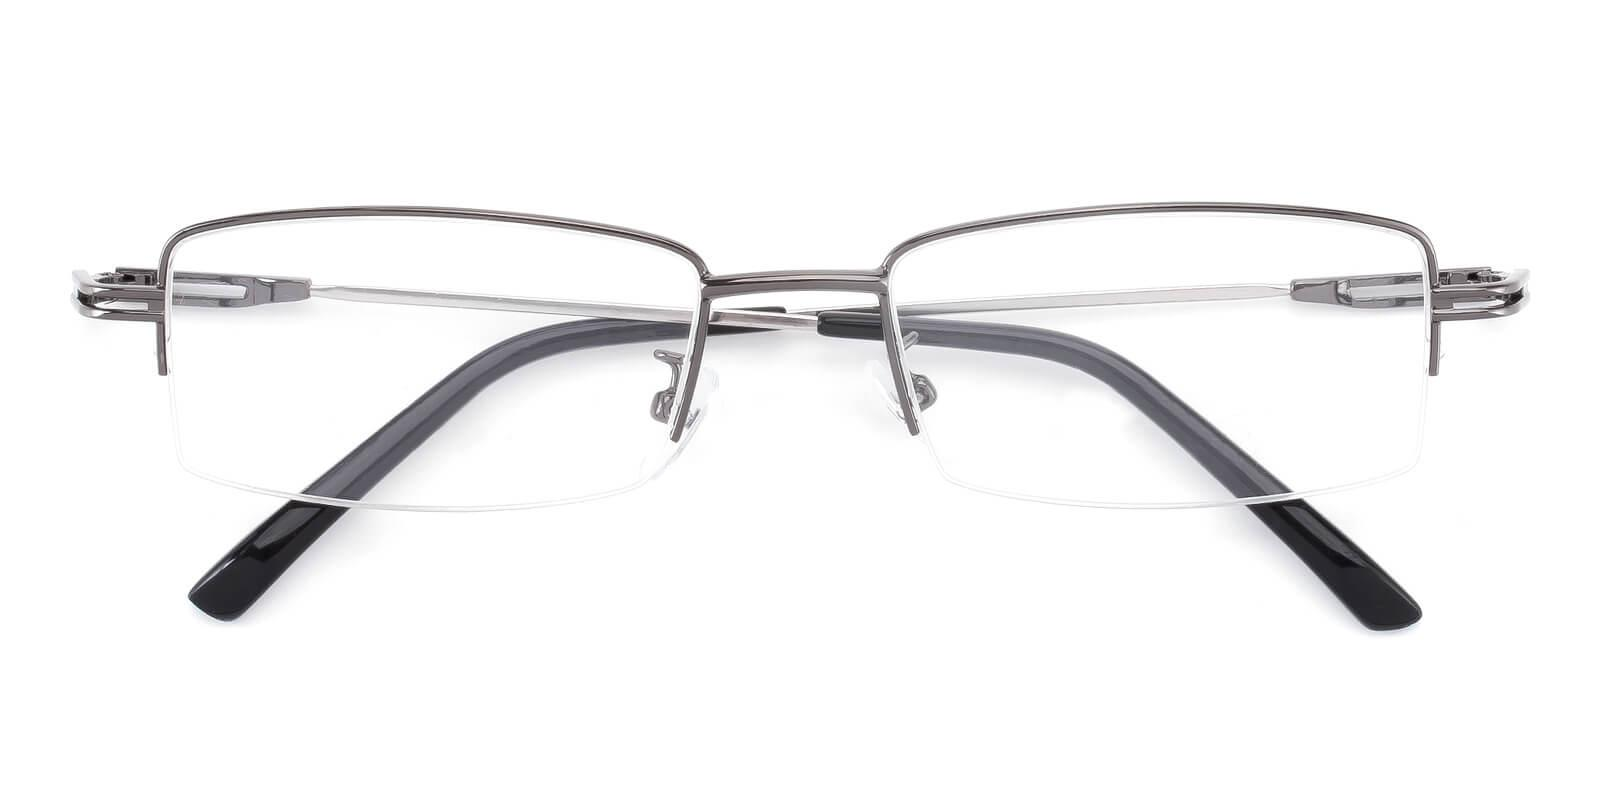 Studio-Gun-Rectangle-Metal-Eyeglasses-detail